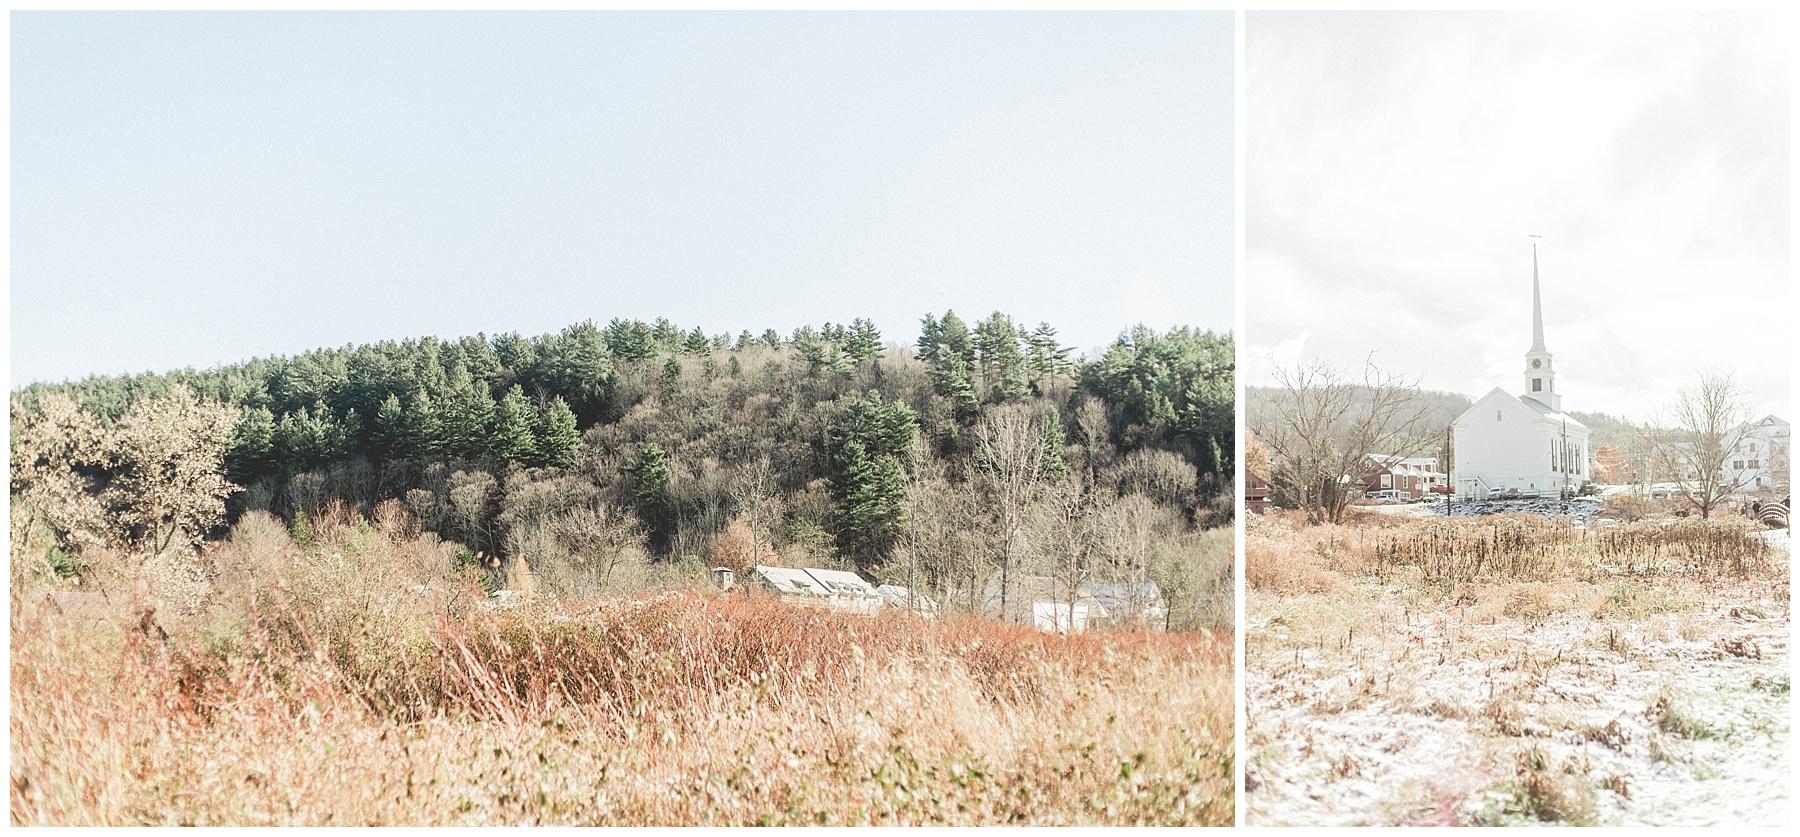 vermont, stowe, engaged, mountains, wanderlove, discoverwanderlove, beauty, proposal, proposal story, ben and jerrys, icecream, rec path